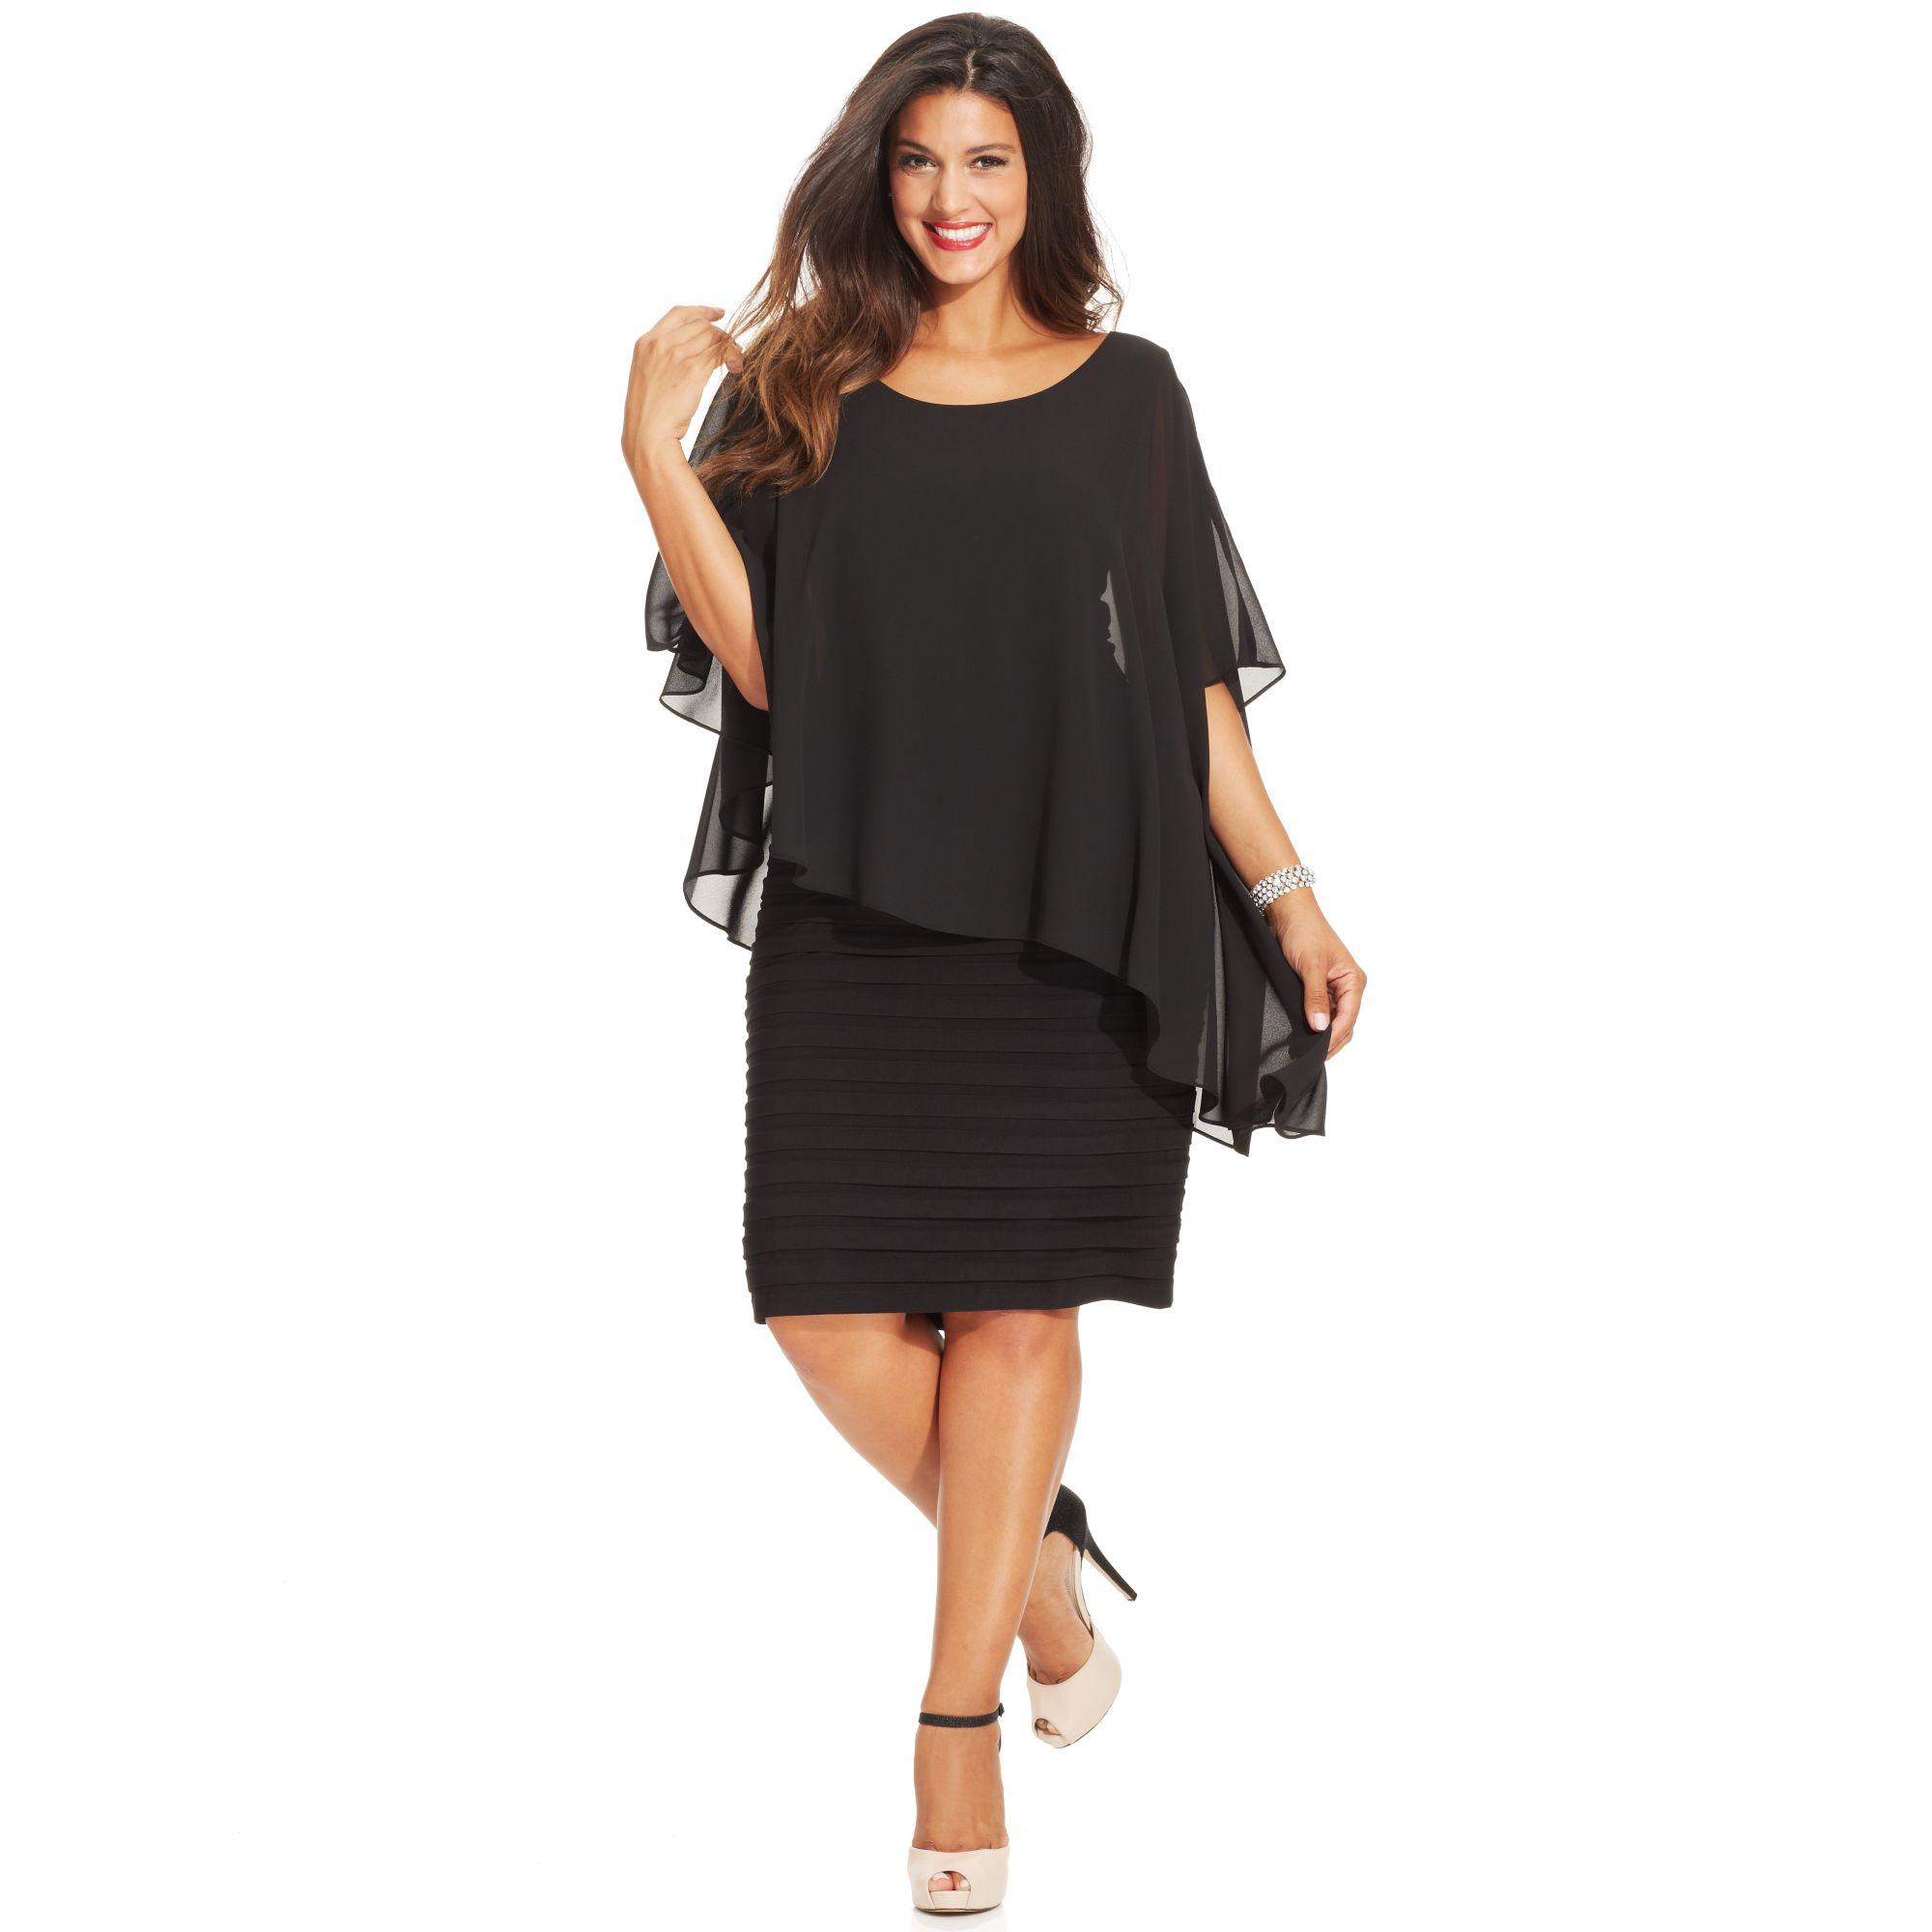 Betsy adam plus size chiffon capelet sheath dress in for Macy black dress wear to wedding